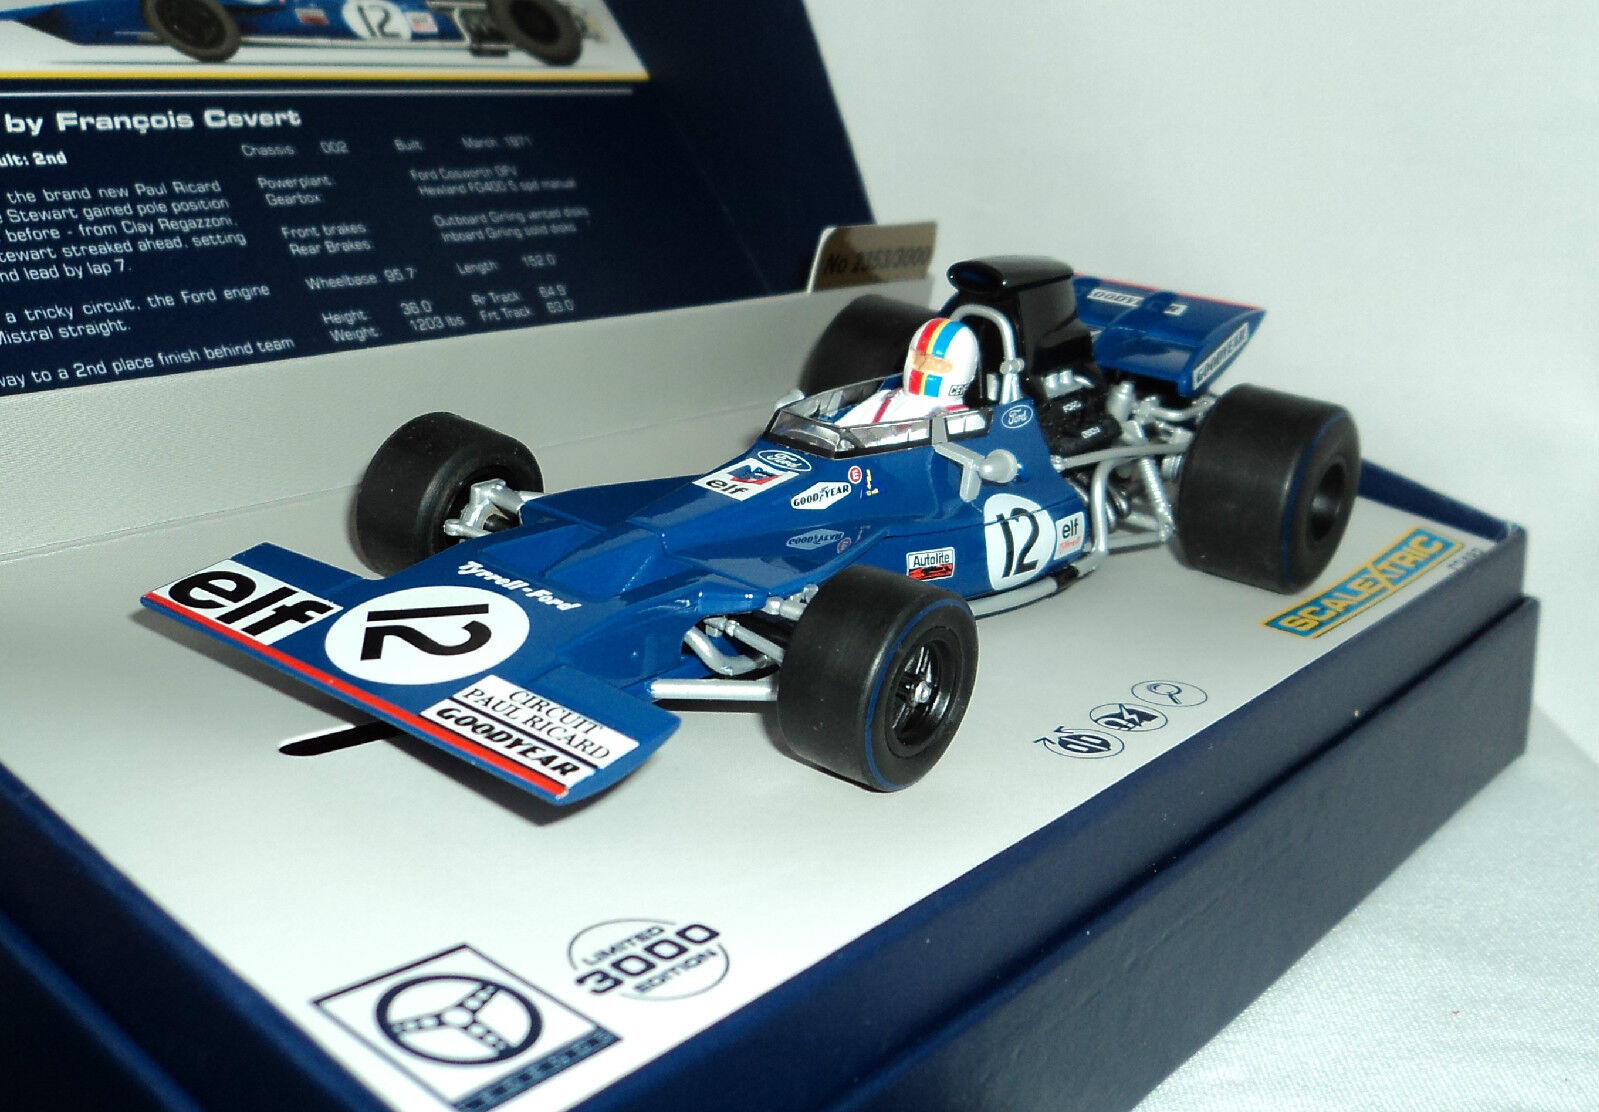 Scalextric C3482A Tyrrell 002 en serie limitée Paul Ricard 1 32 Slot Car